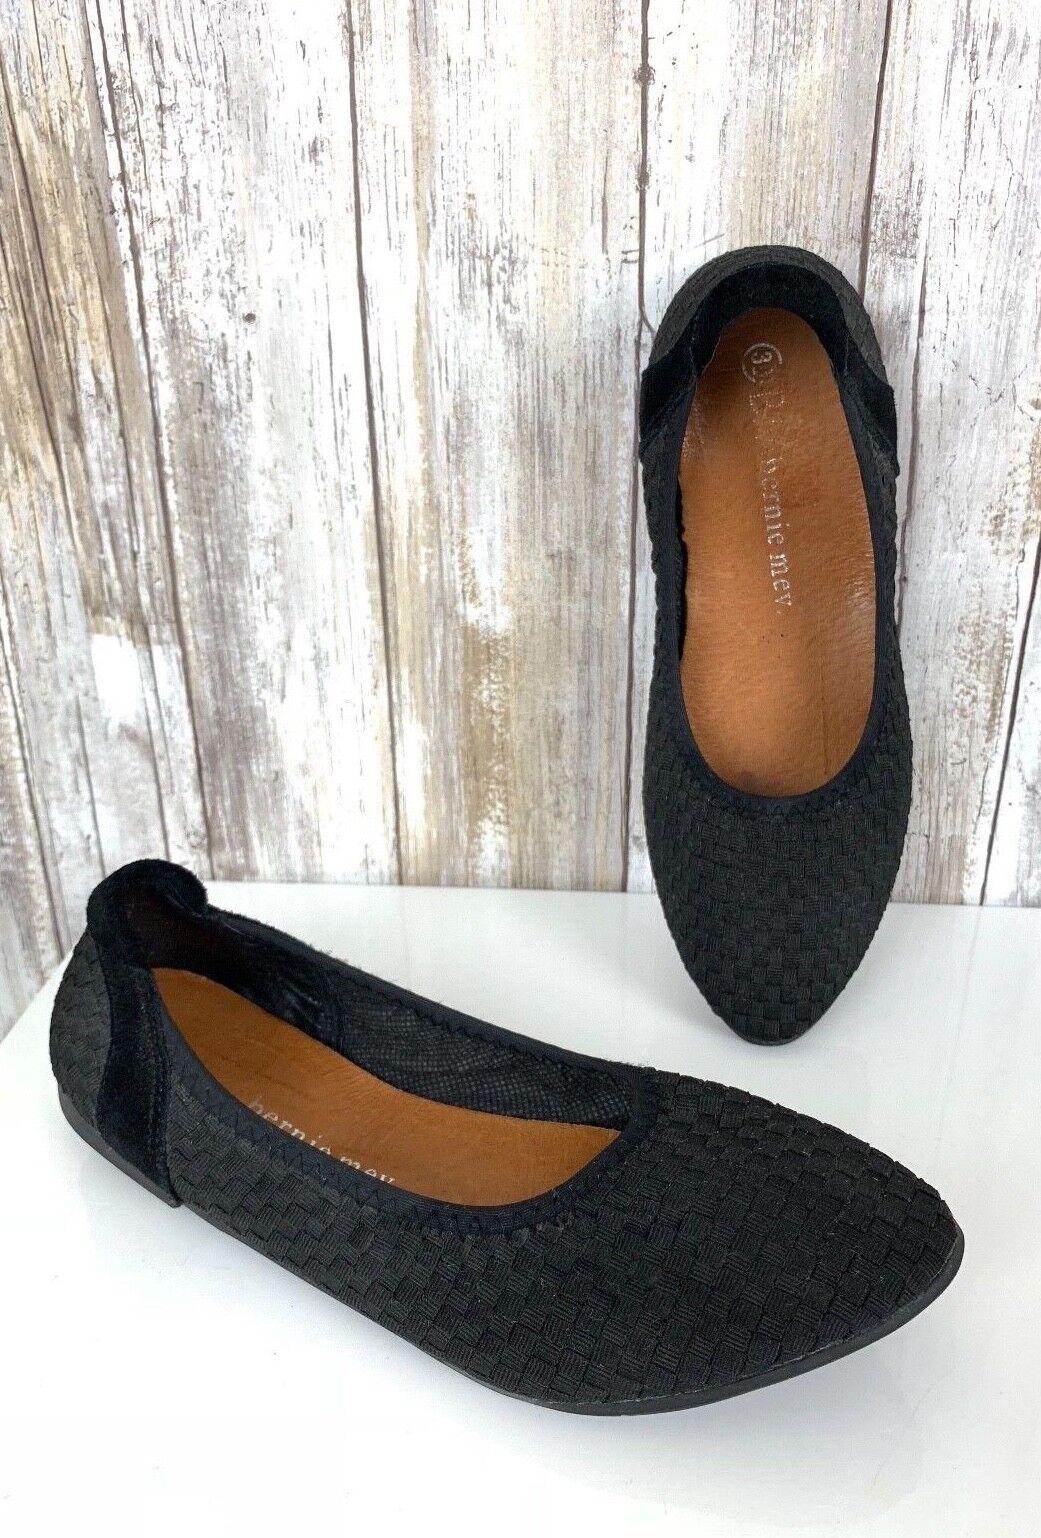 Bernie Mev Women's shoes Slip Ons Woven Semi Pointed Black Ballet Flats 38 7.5